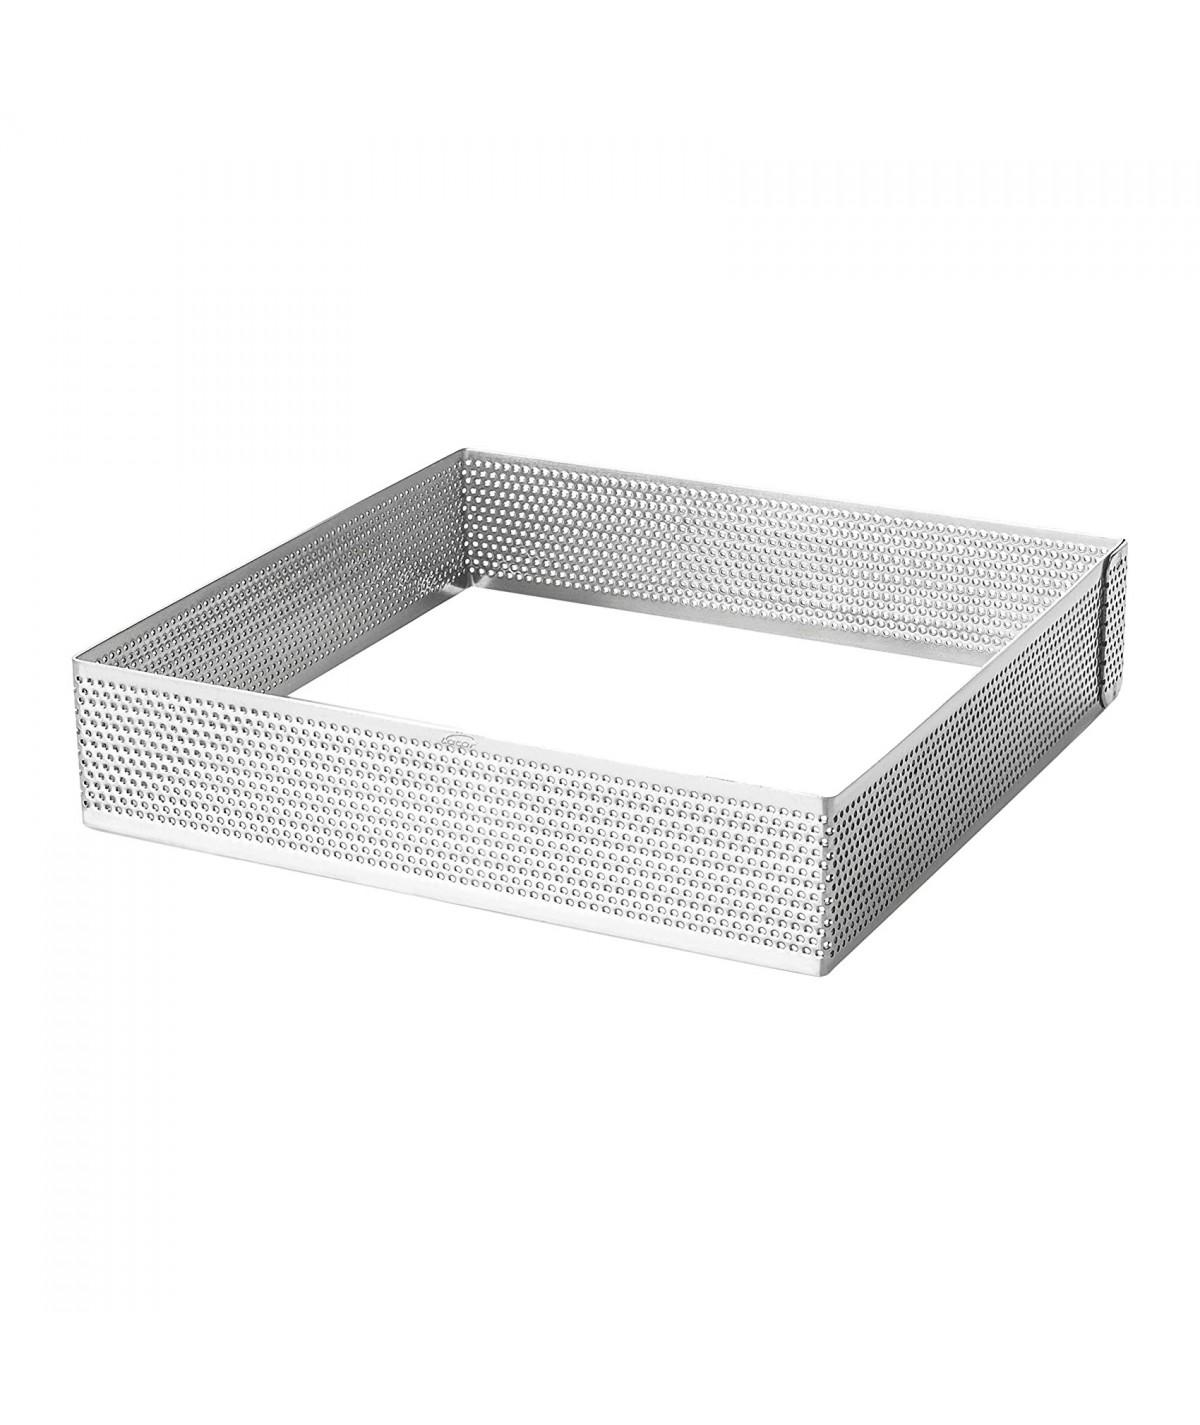 Perforated tart ring - Square 16cm